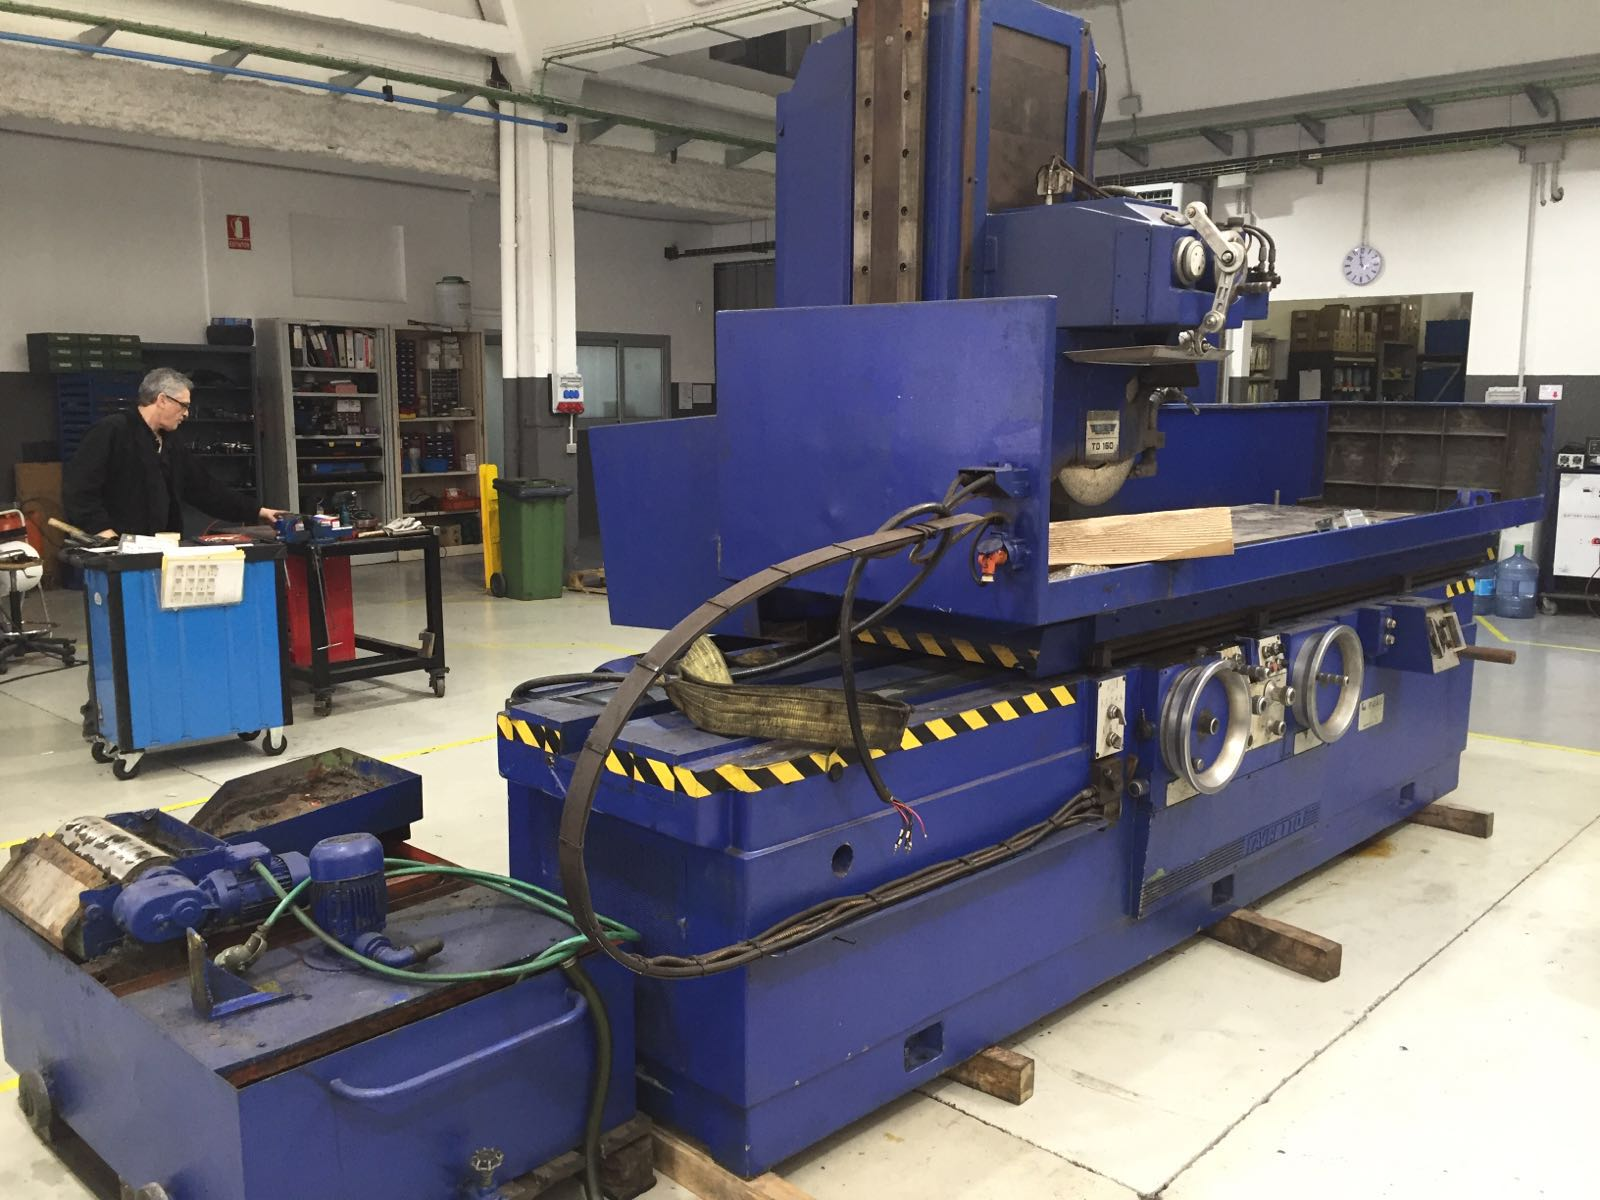 Vender maquinaria industrial usada